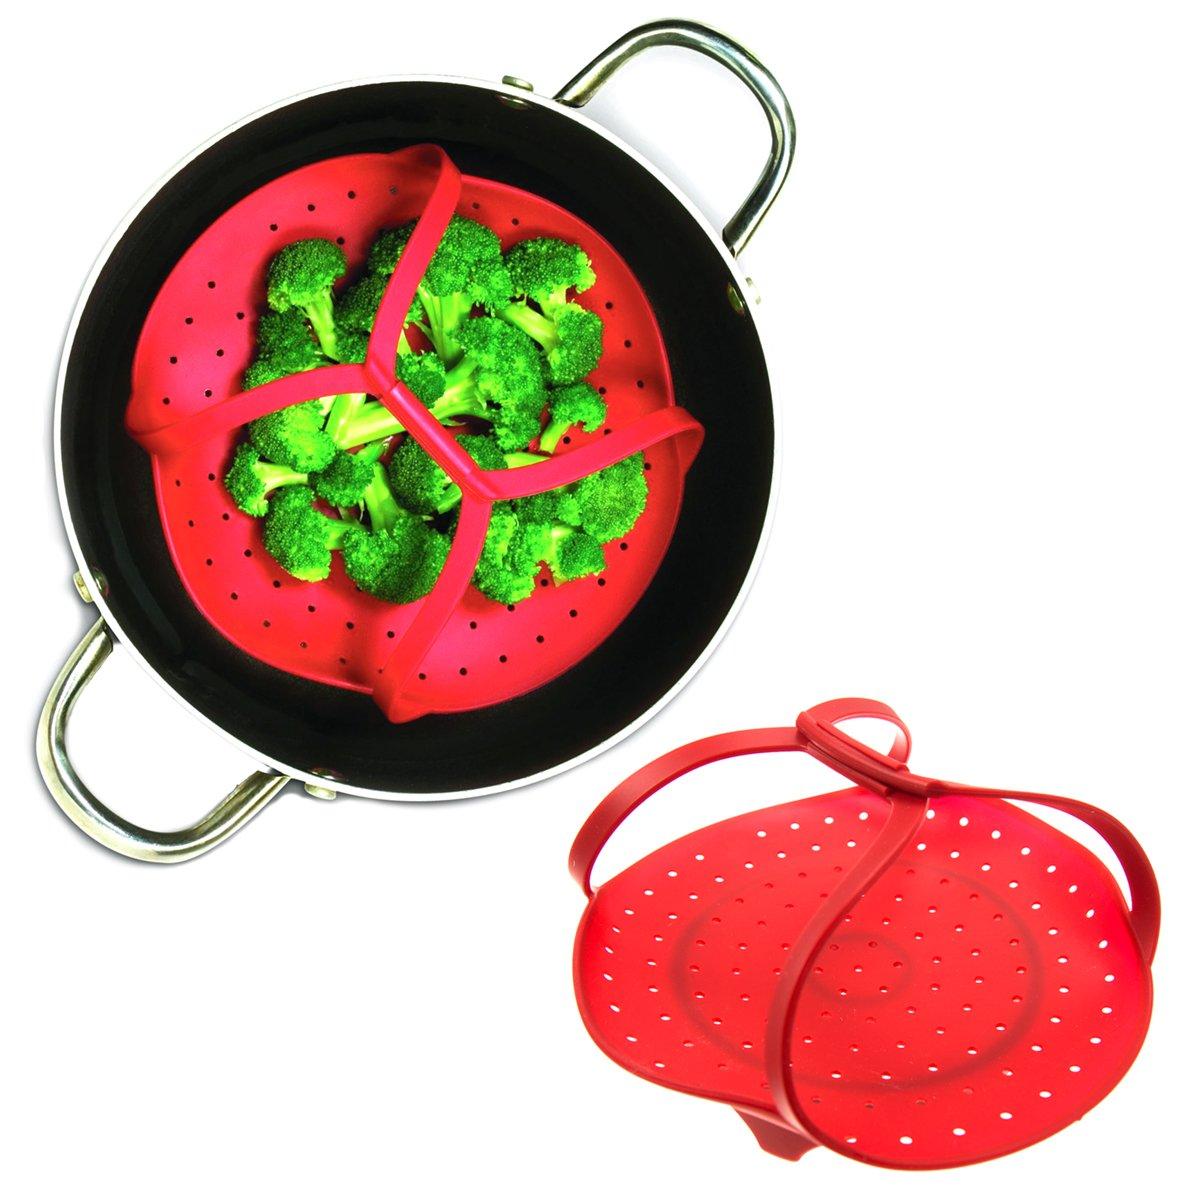 2 Pack Tovolo Silicone Steamer Basket Handle Vegetables Food Pressure Cooker Insert